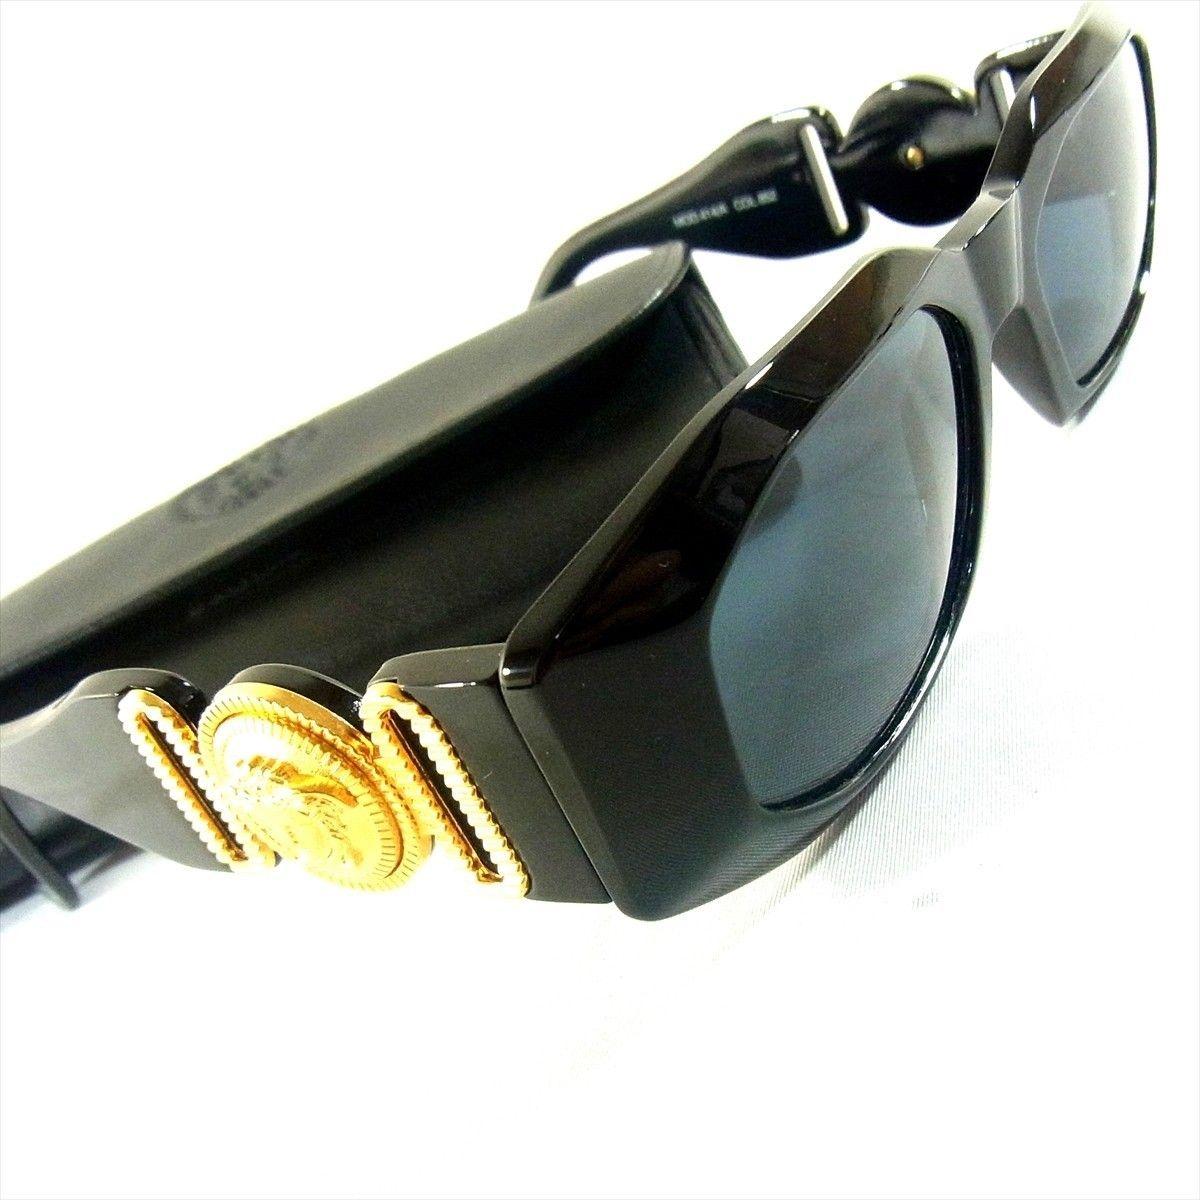 7cb32a3fa2e7 Gianni Versace Women s Sunglasses (Pre-owned Ladies Gold Medusa Head Logos  Sun Glasses Eye Wear